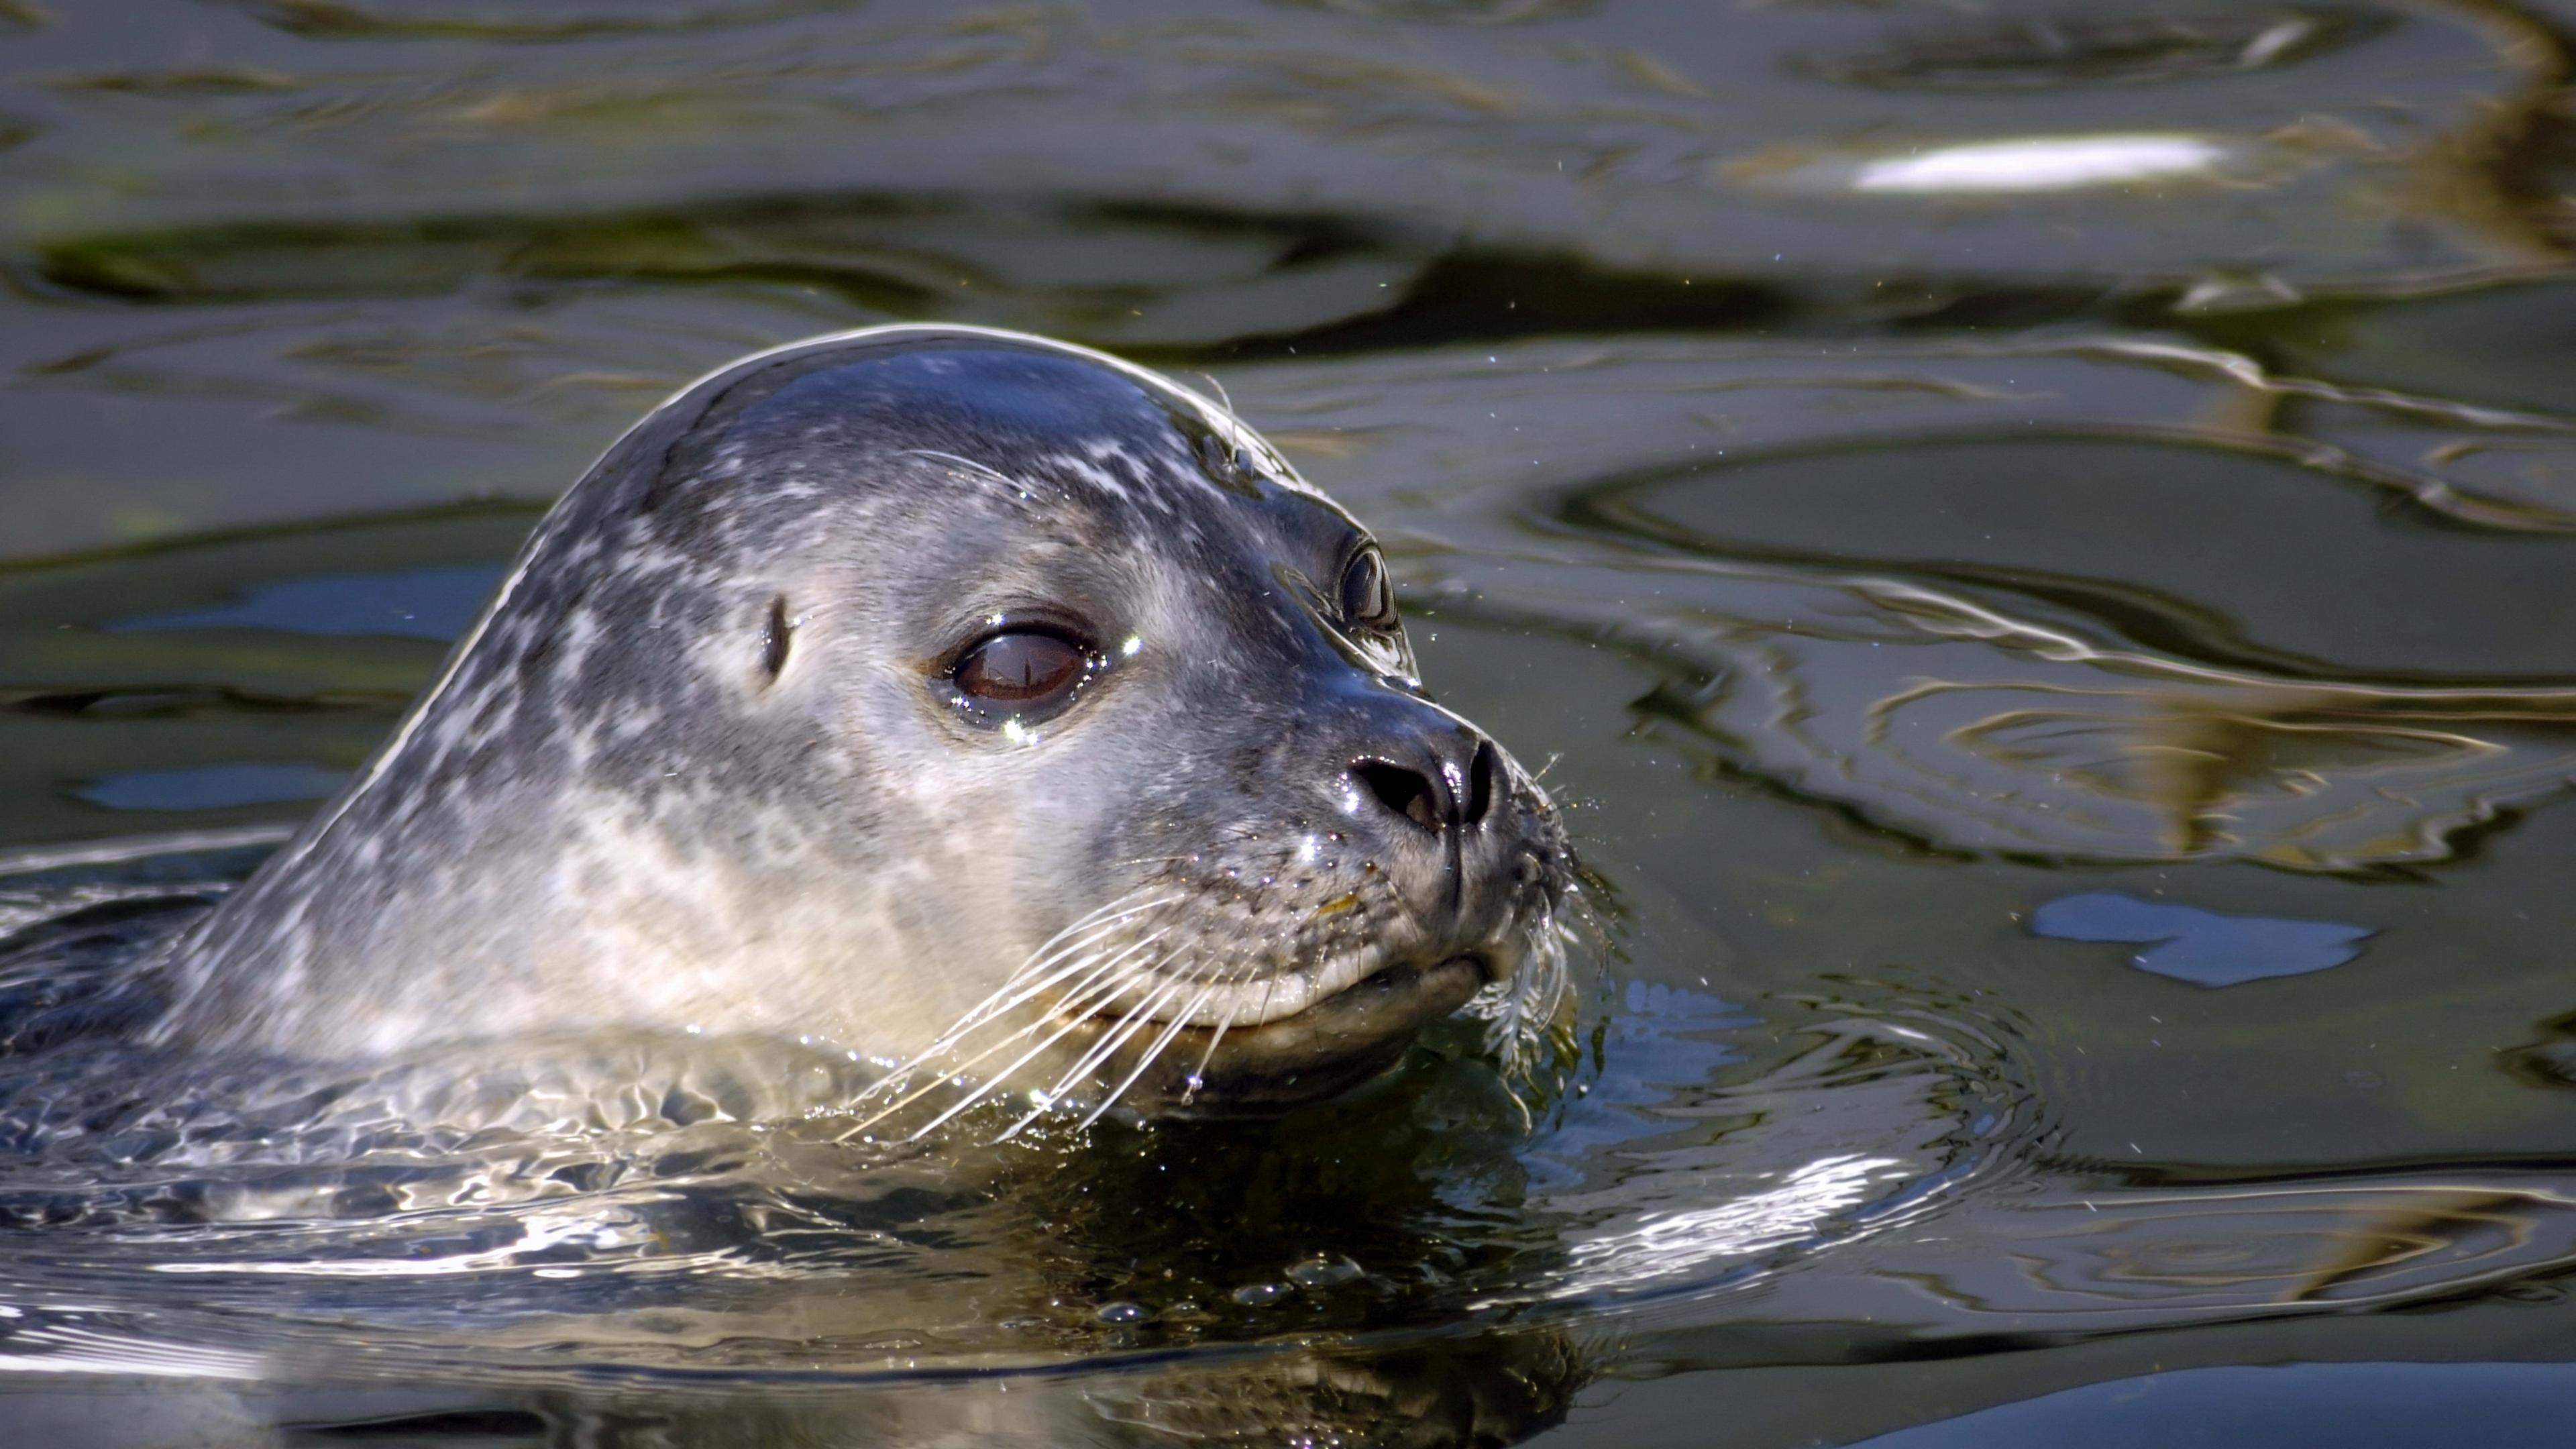 seal water swim 4k 1542241635 - seal, water, swim 4k - Water, swim, seal